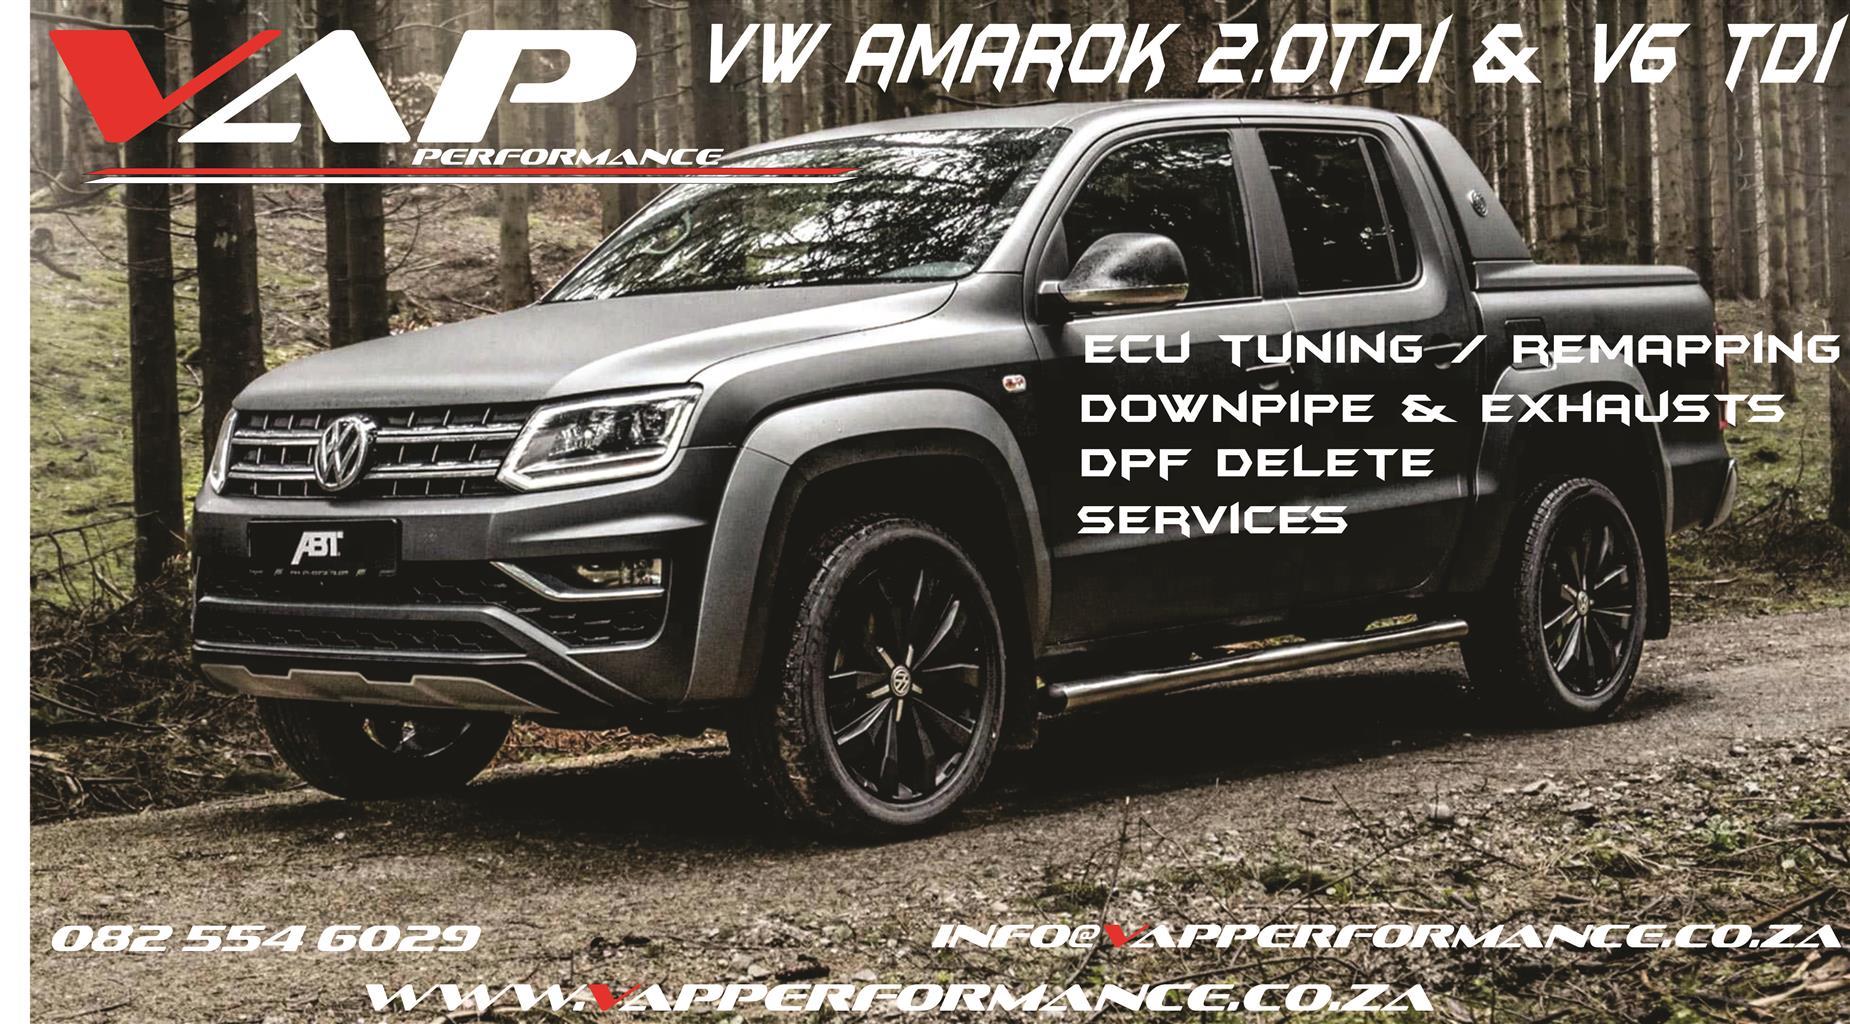 VW Amarok 3.0 TDI V6 Tuning / ECU Remapping / Performance